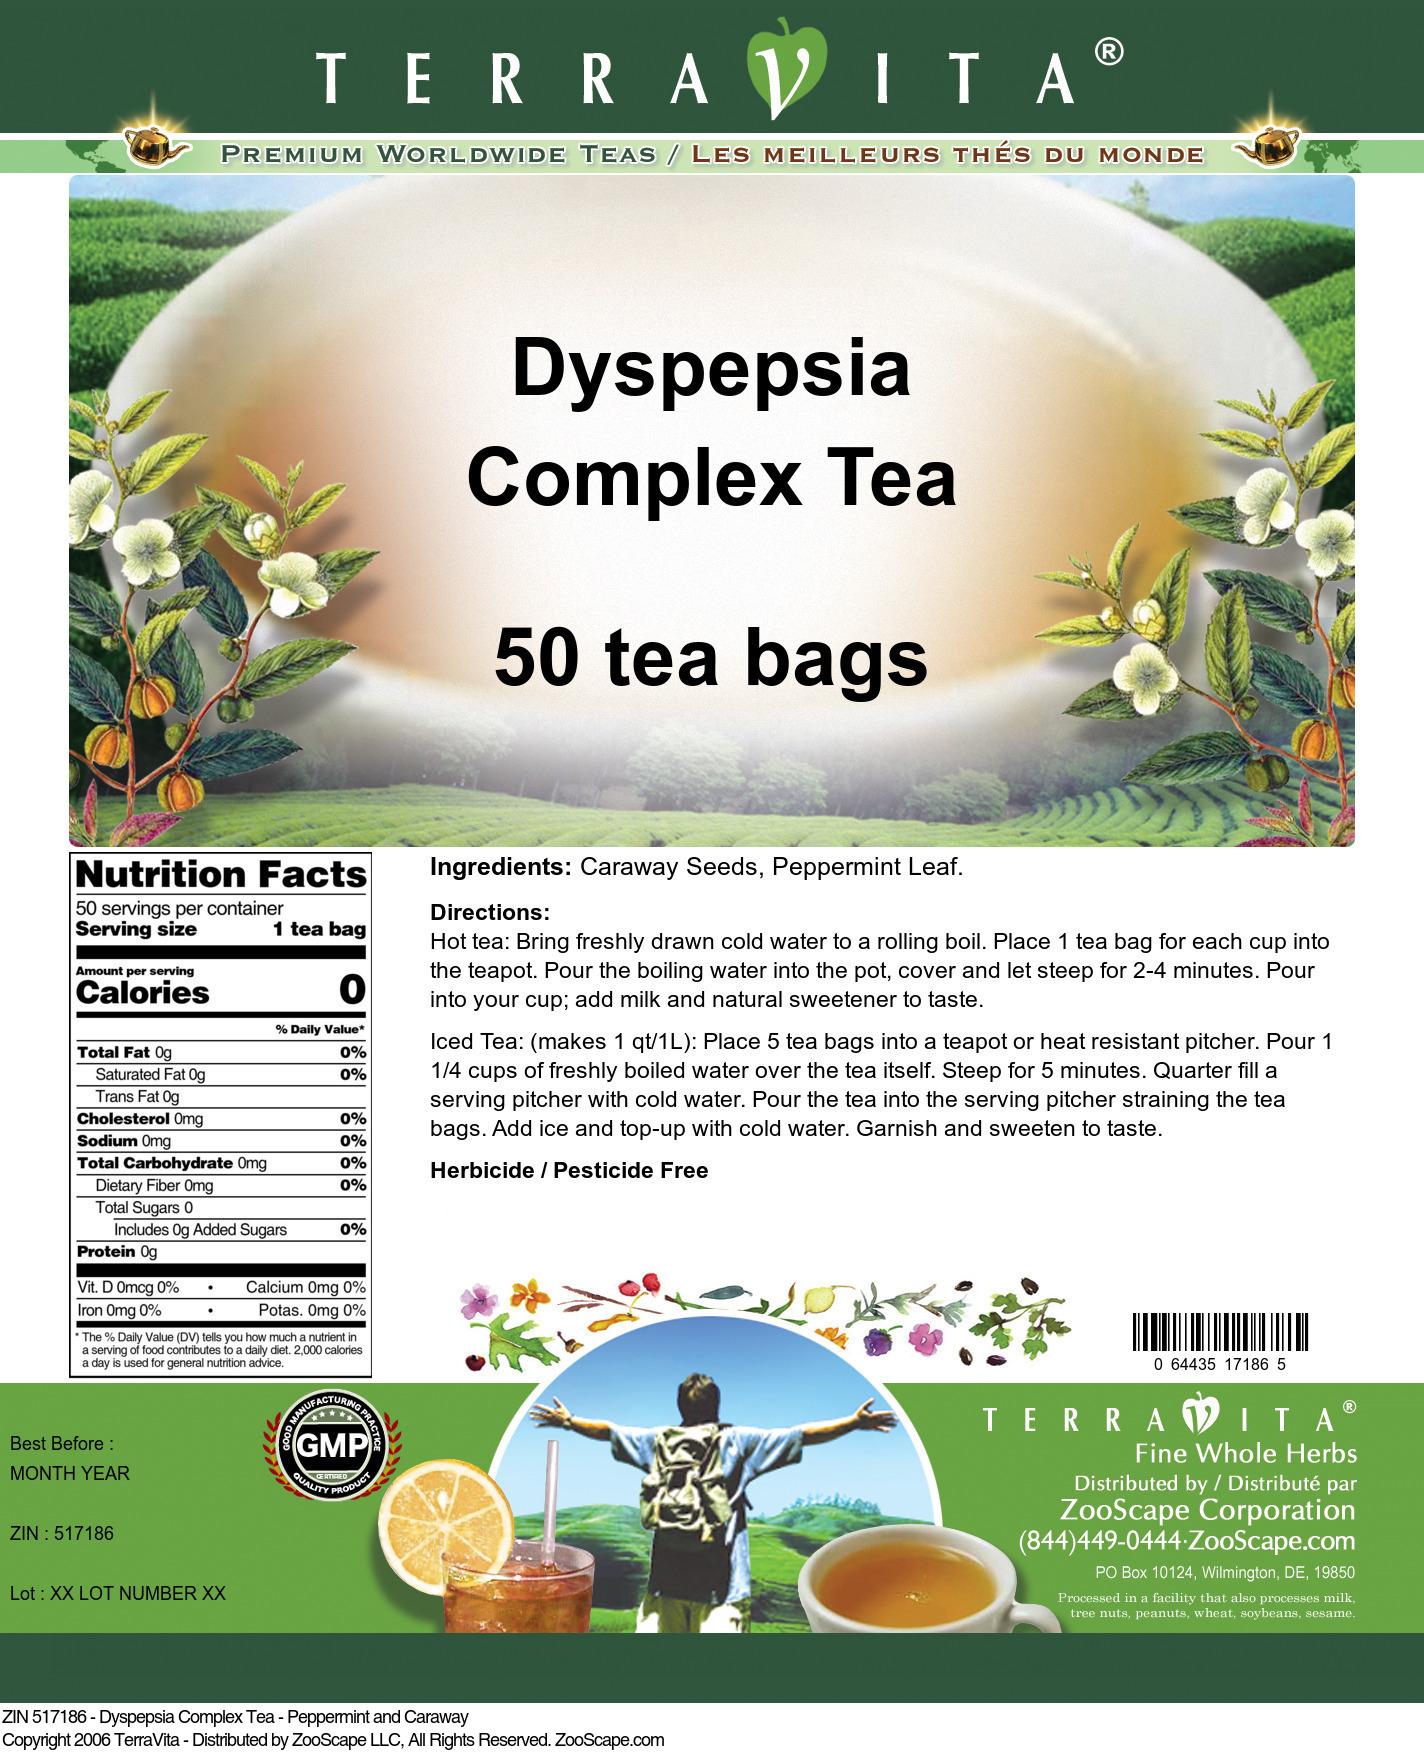 Dyspepsia Complex